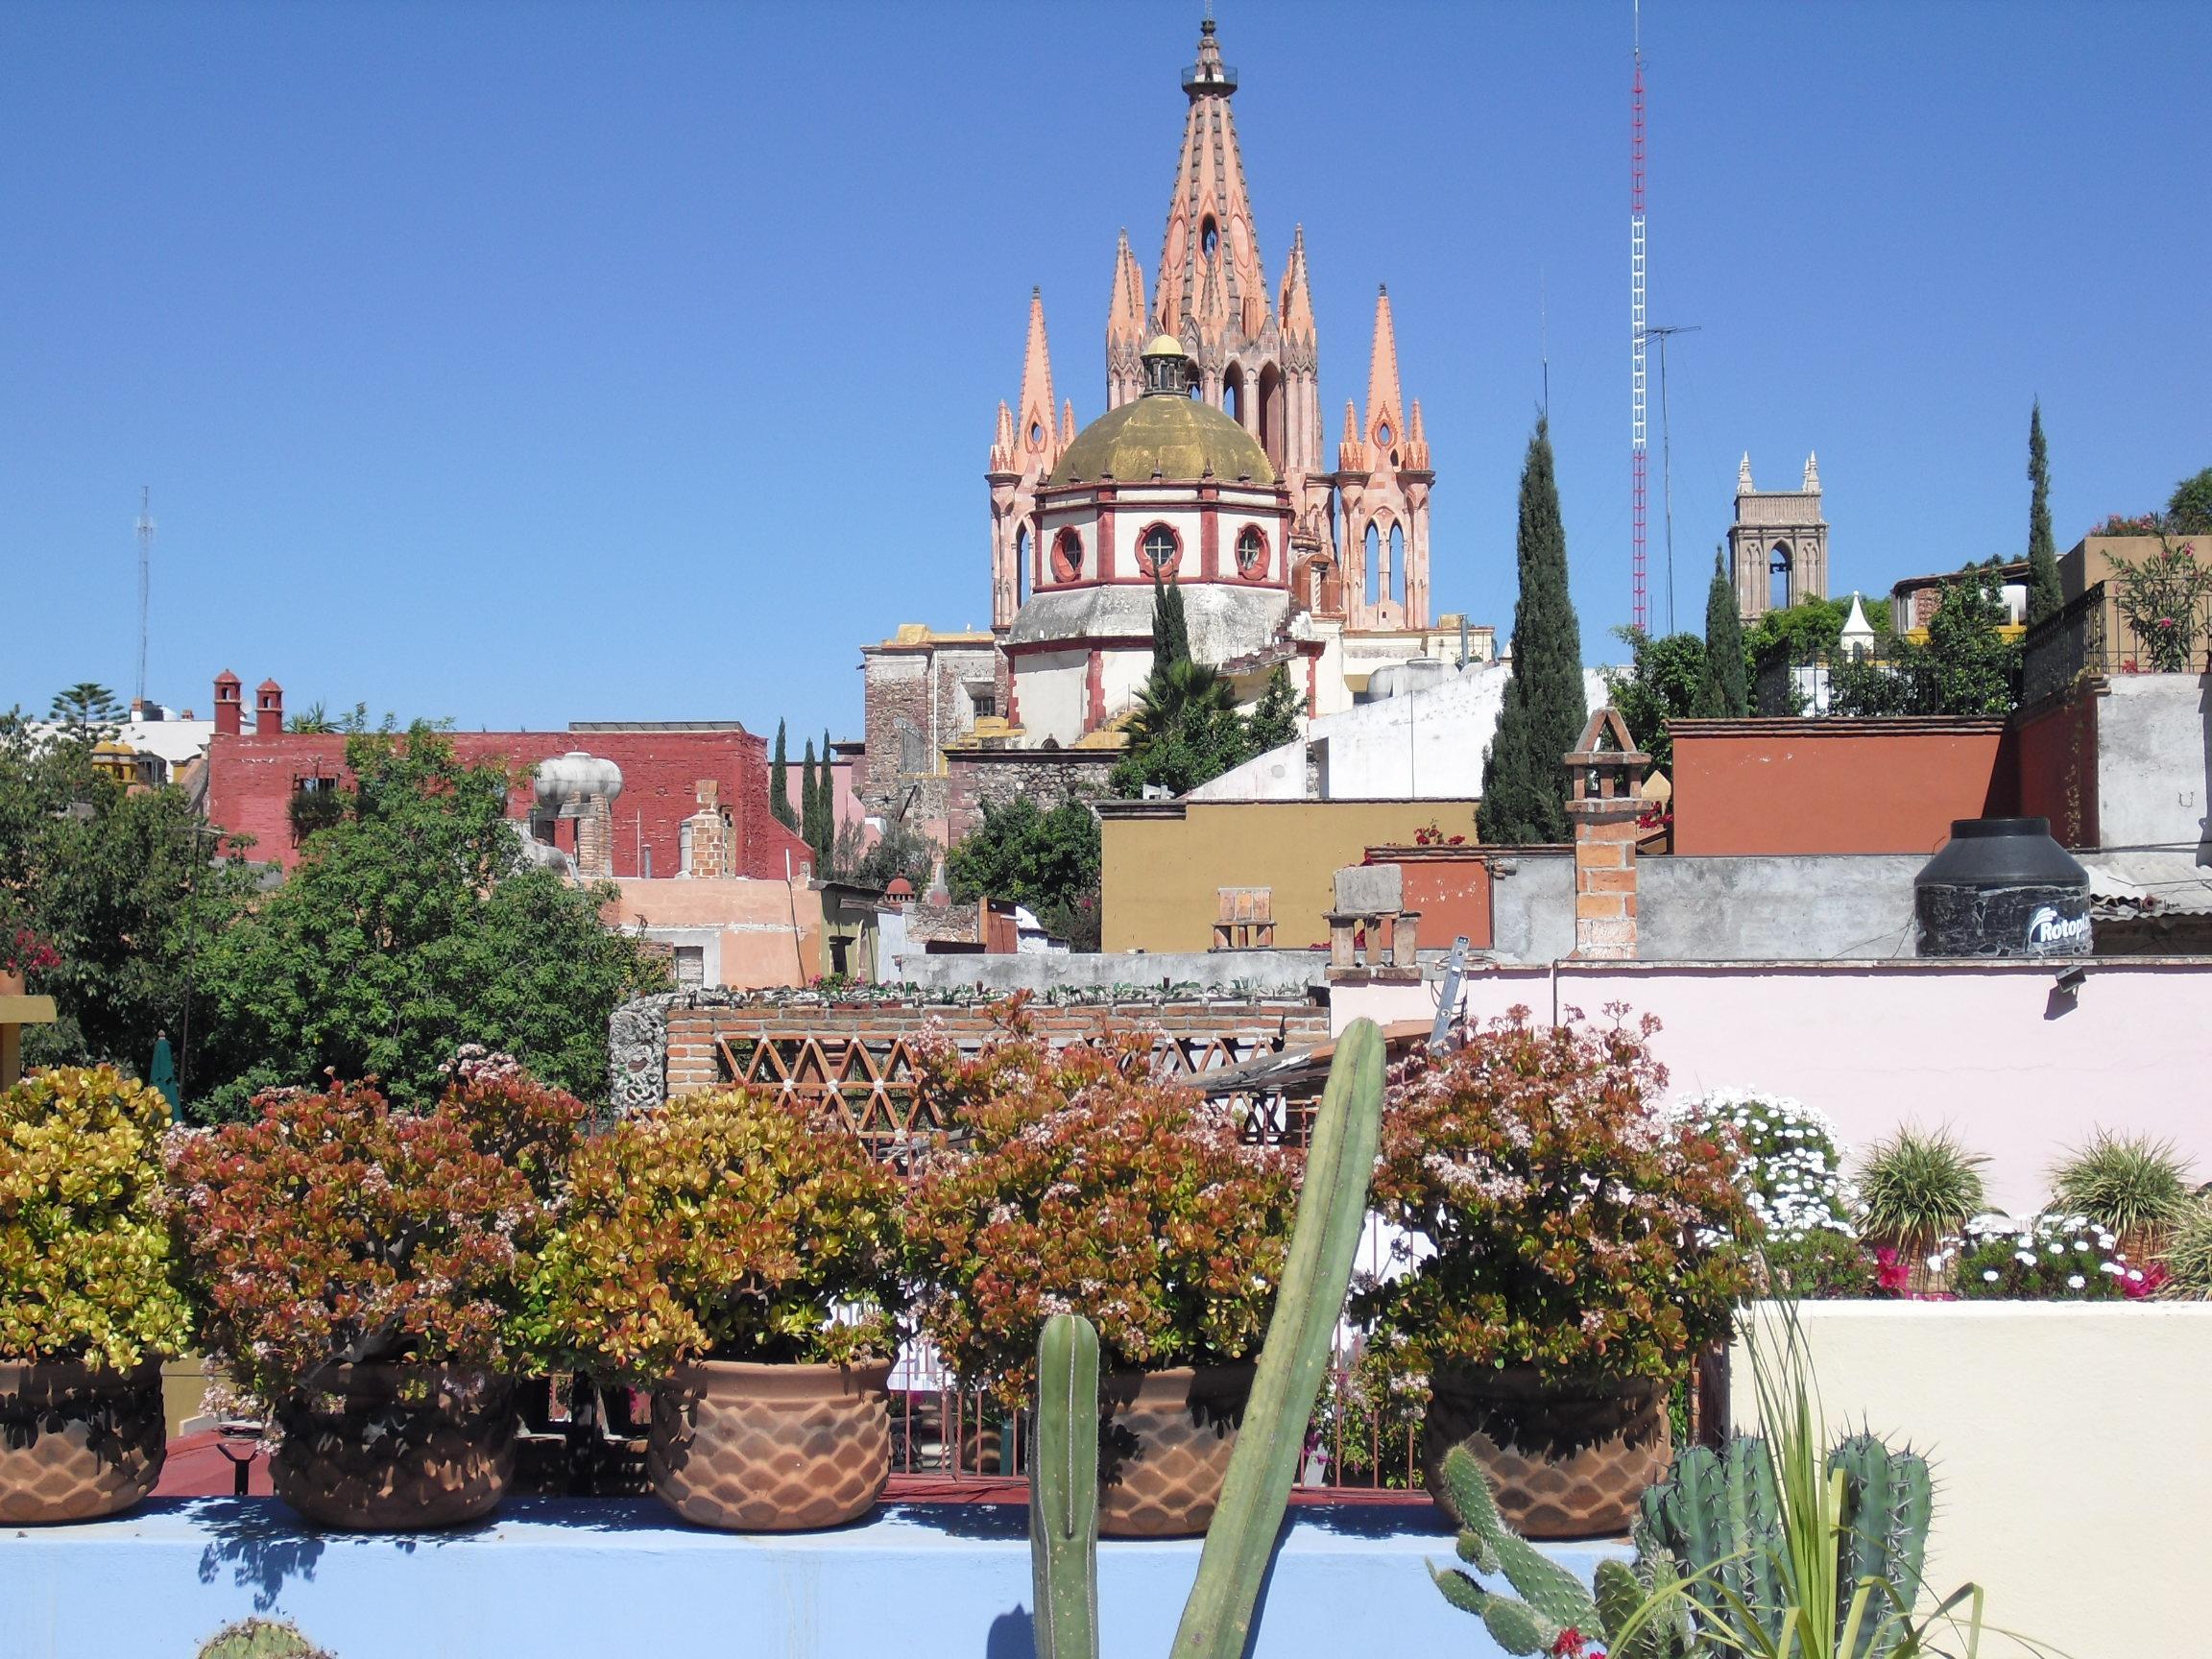 CasaEstrellaGrande_15 view